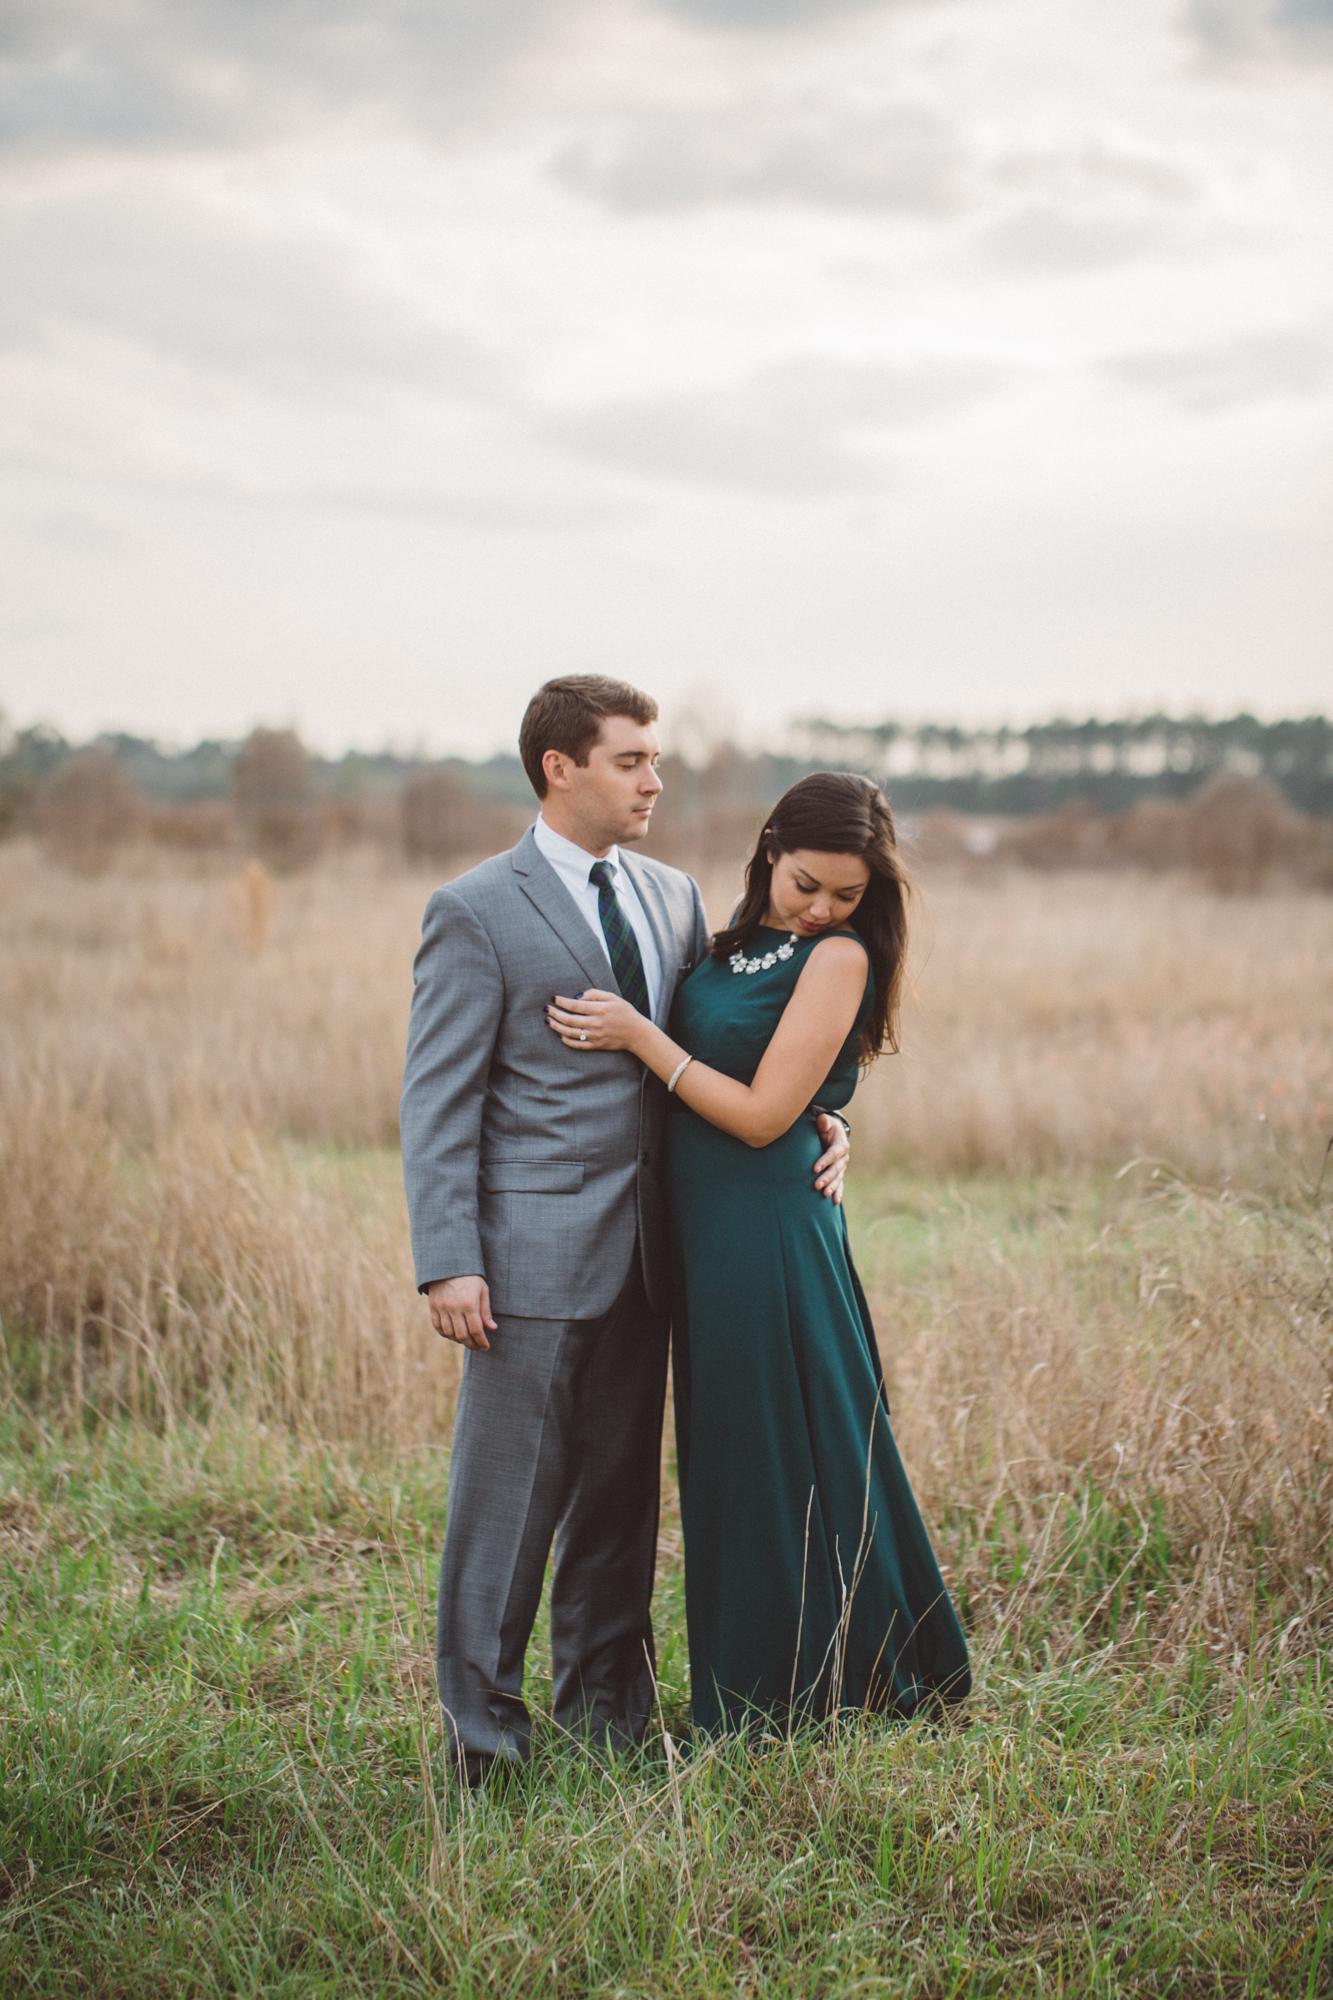 Orlando Engagement Photographer-32.jpg